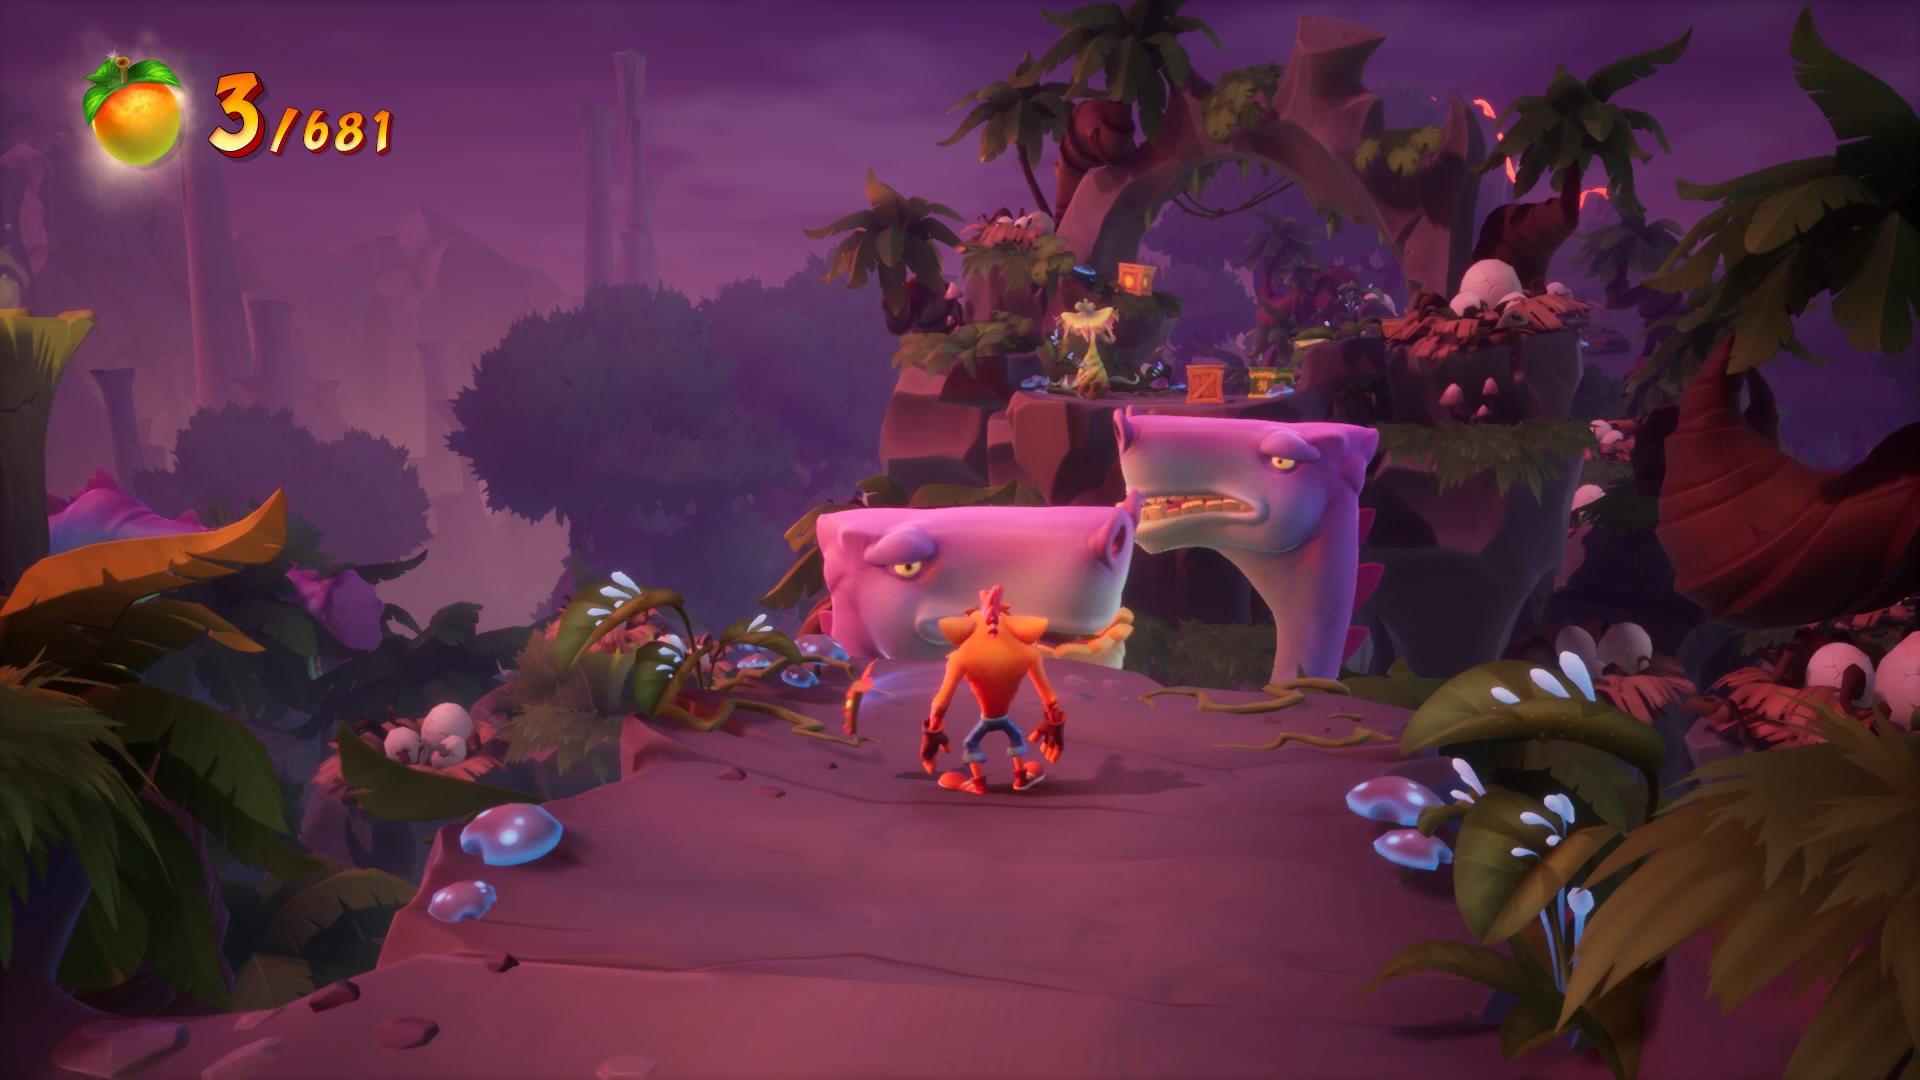 Crash Bandicoot 4 It's About Time Activision